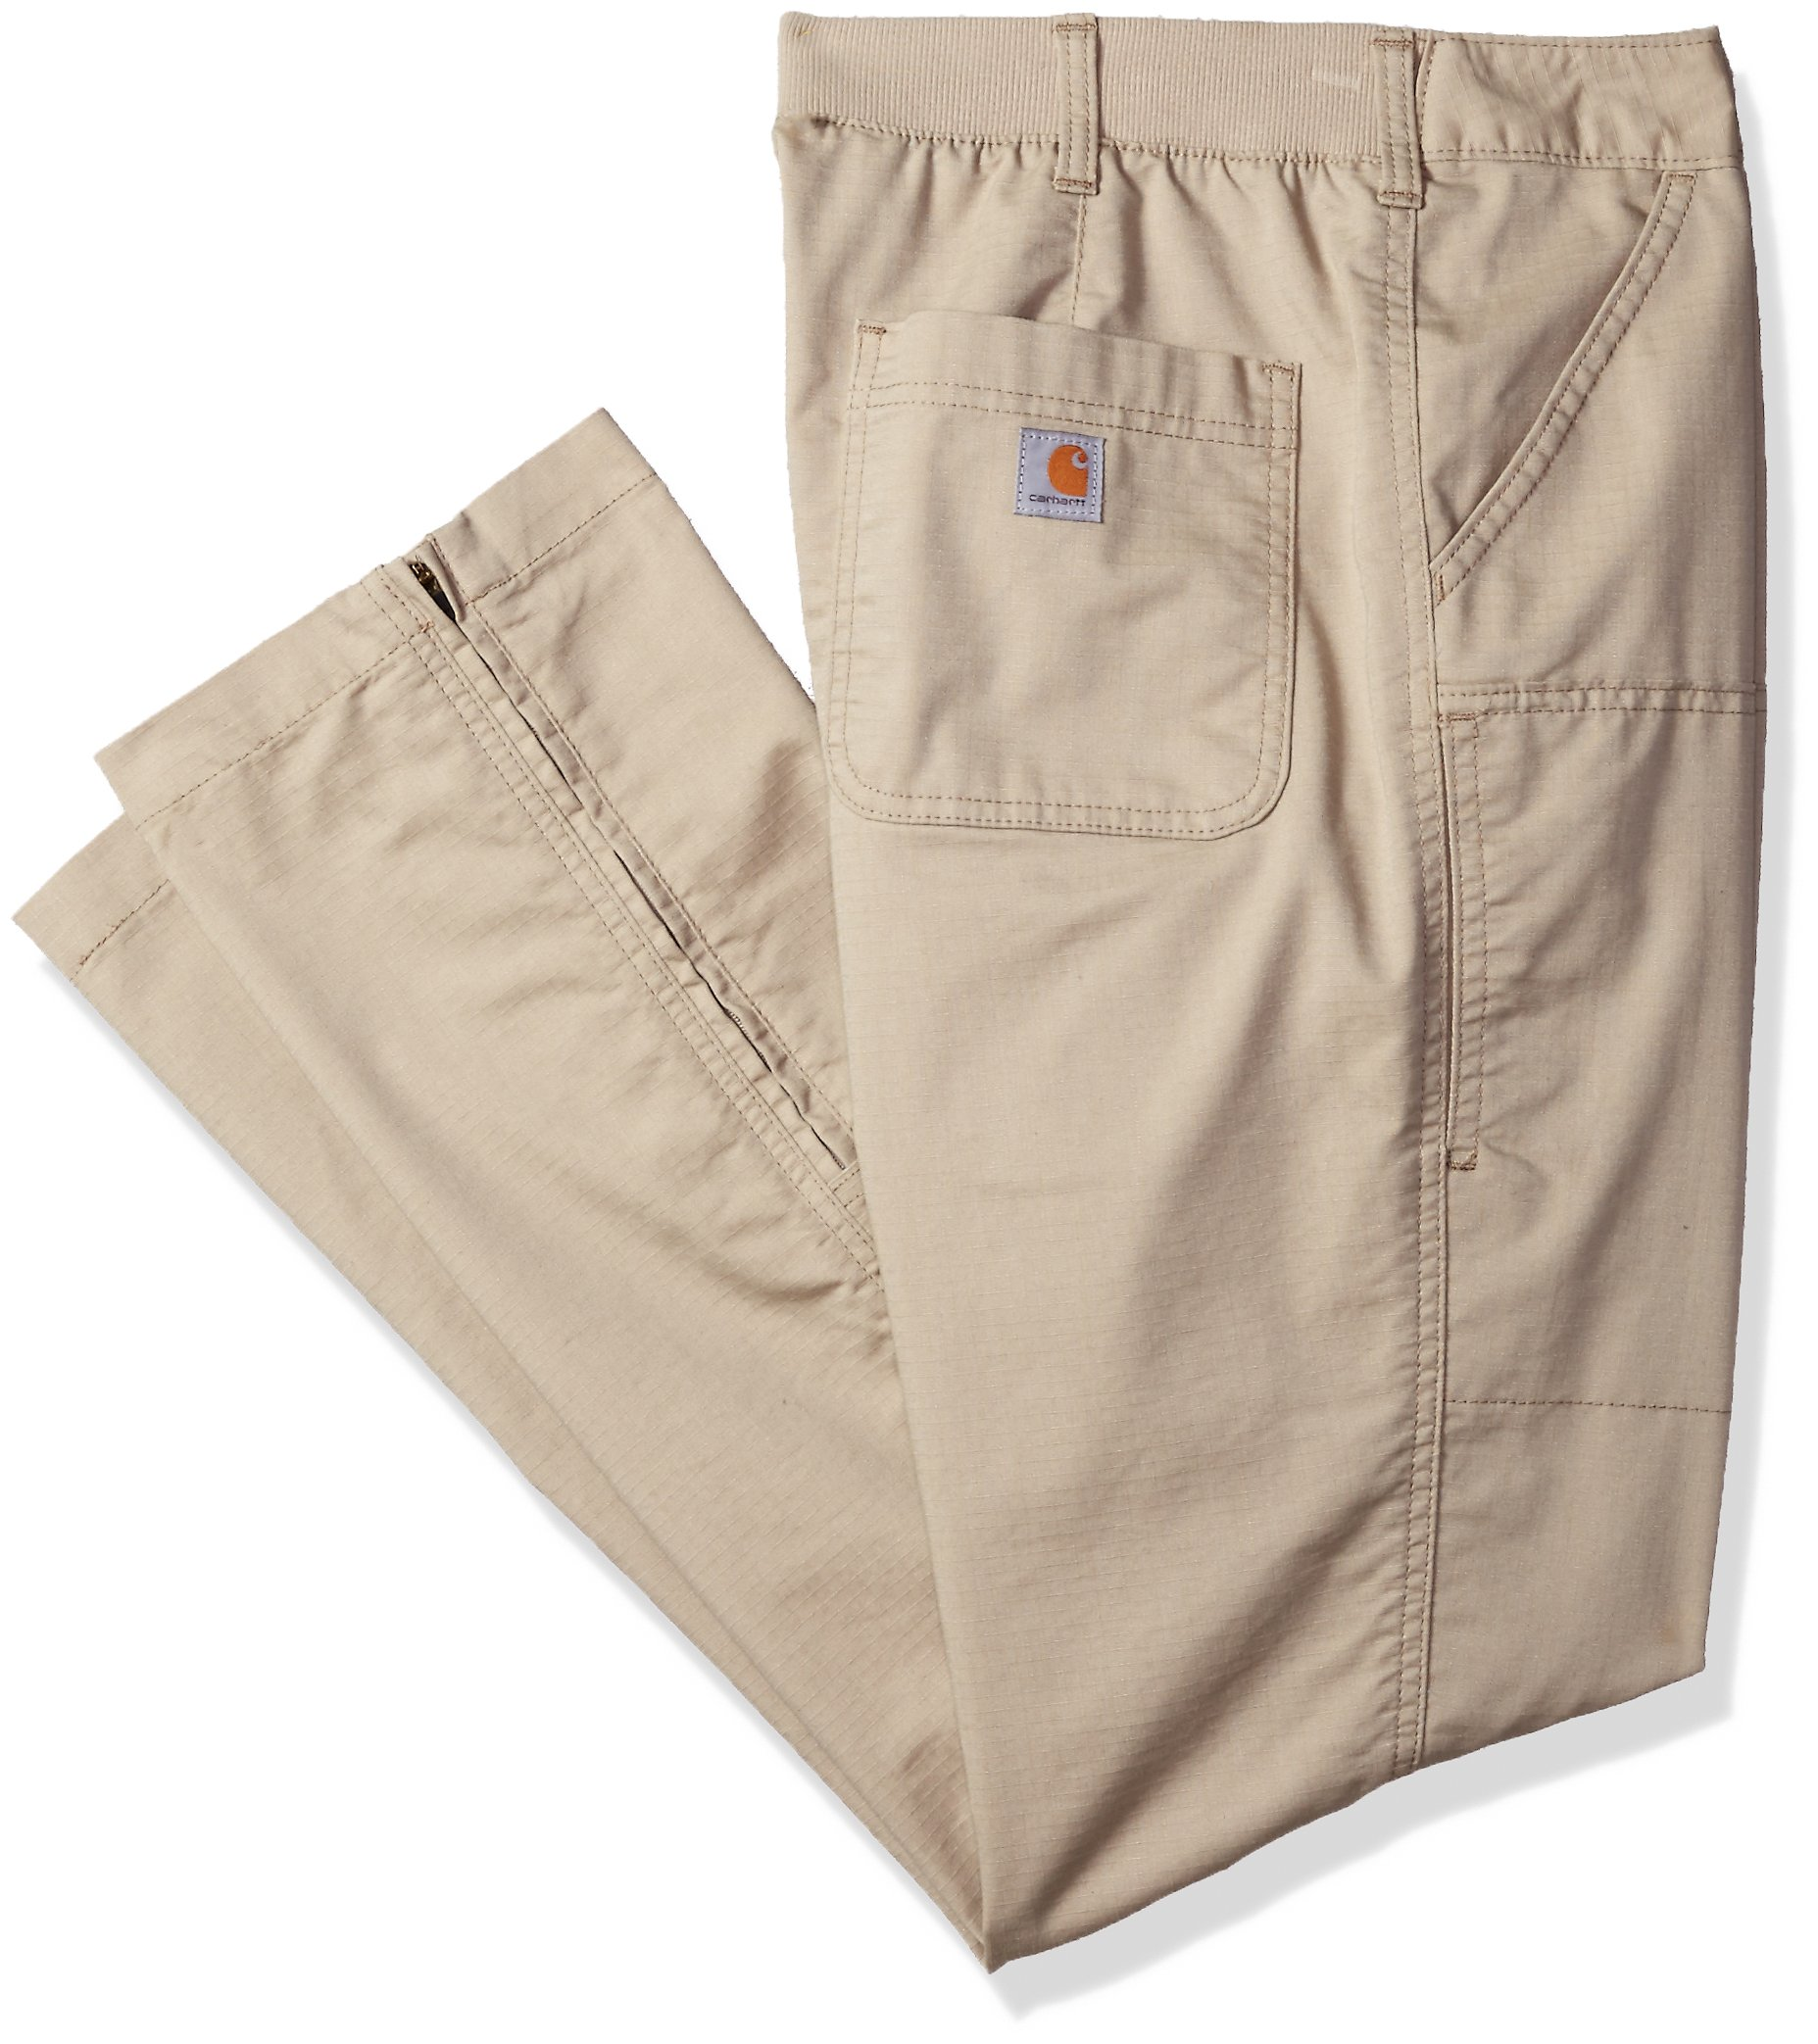 Carhartt Women's Original Fit Smithville Pant